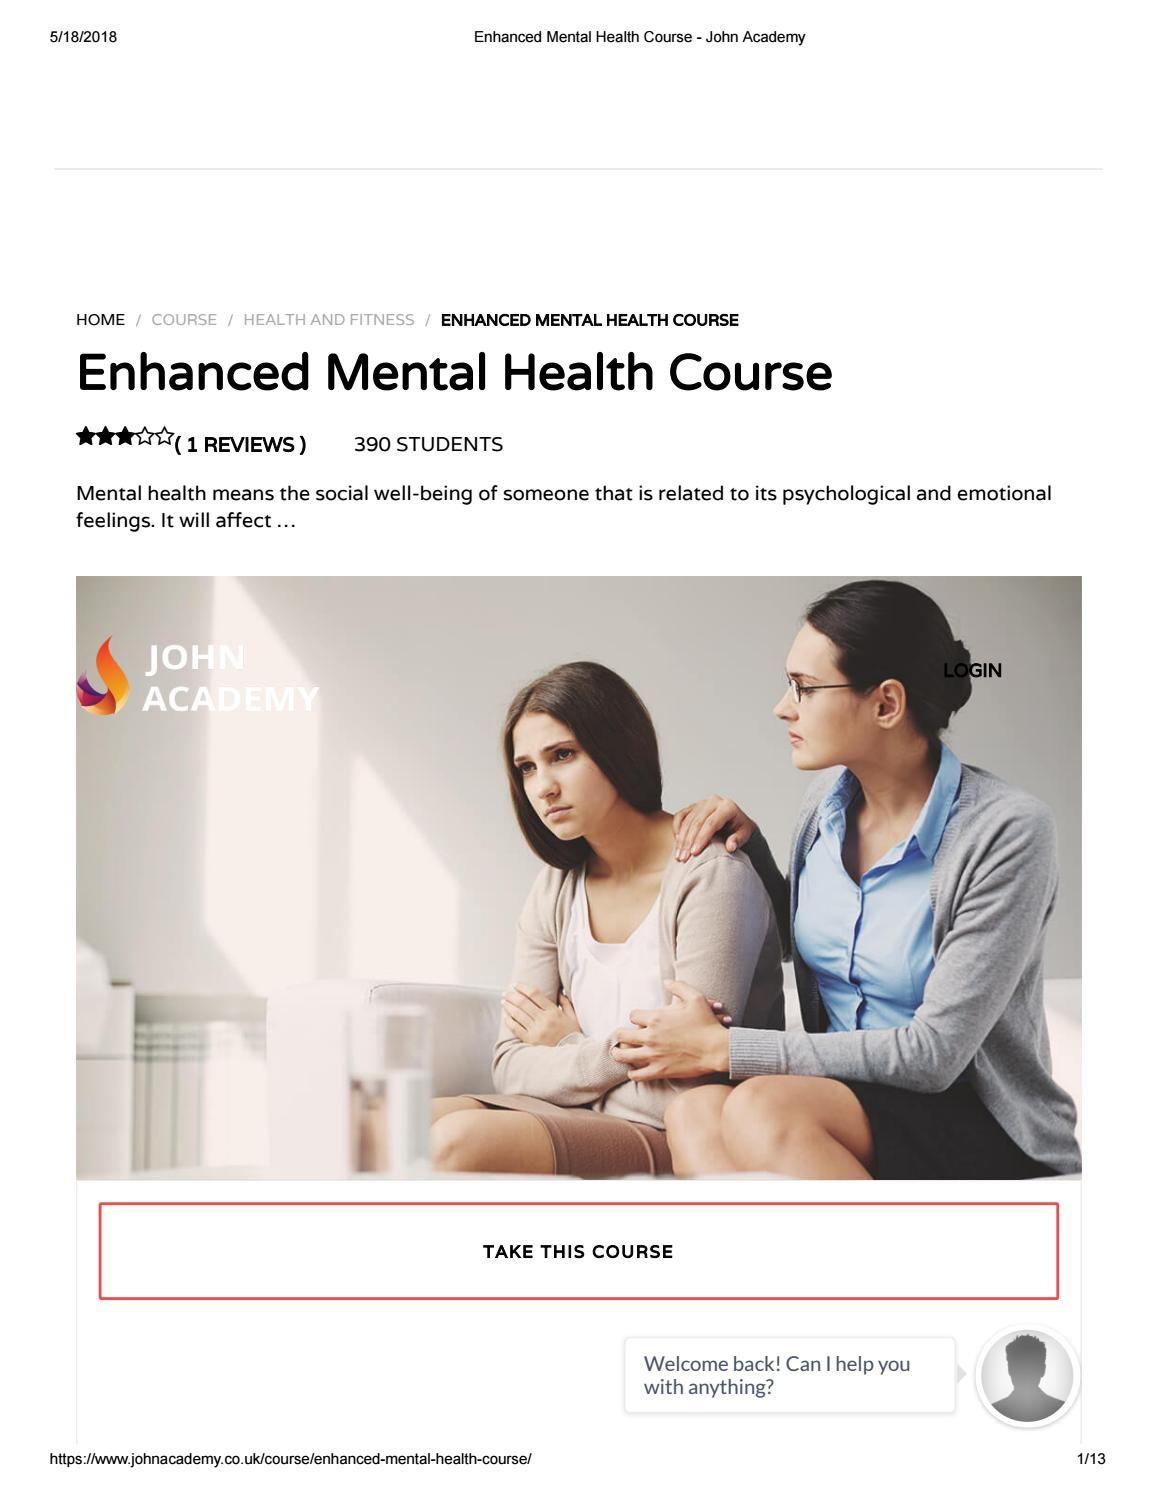 Enhanced Mental Health Course John Academy Mental